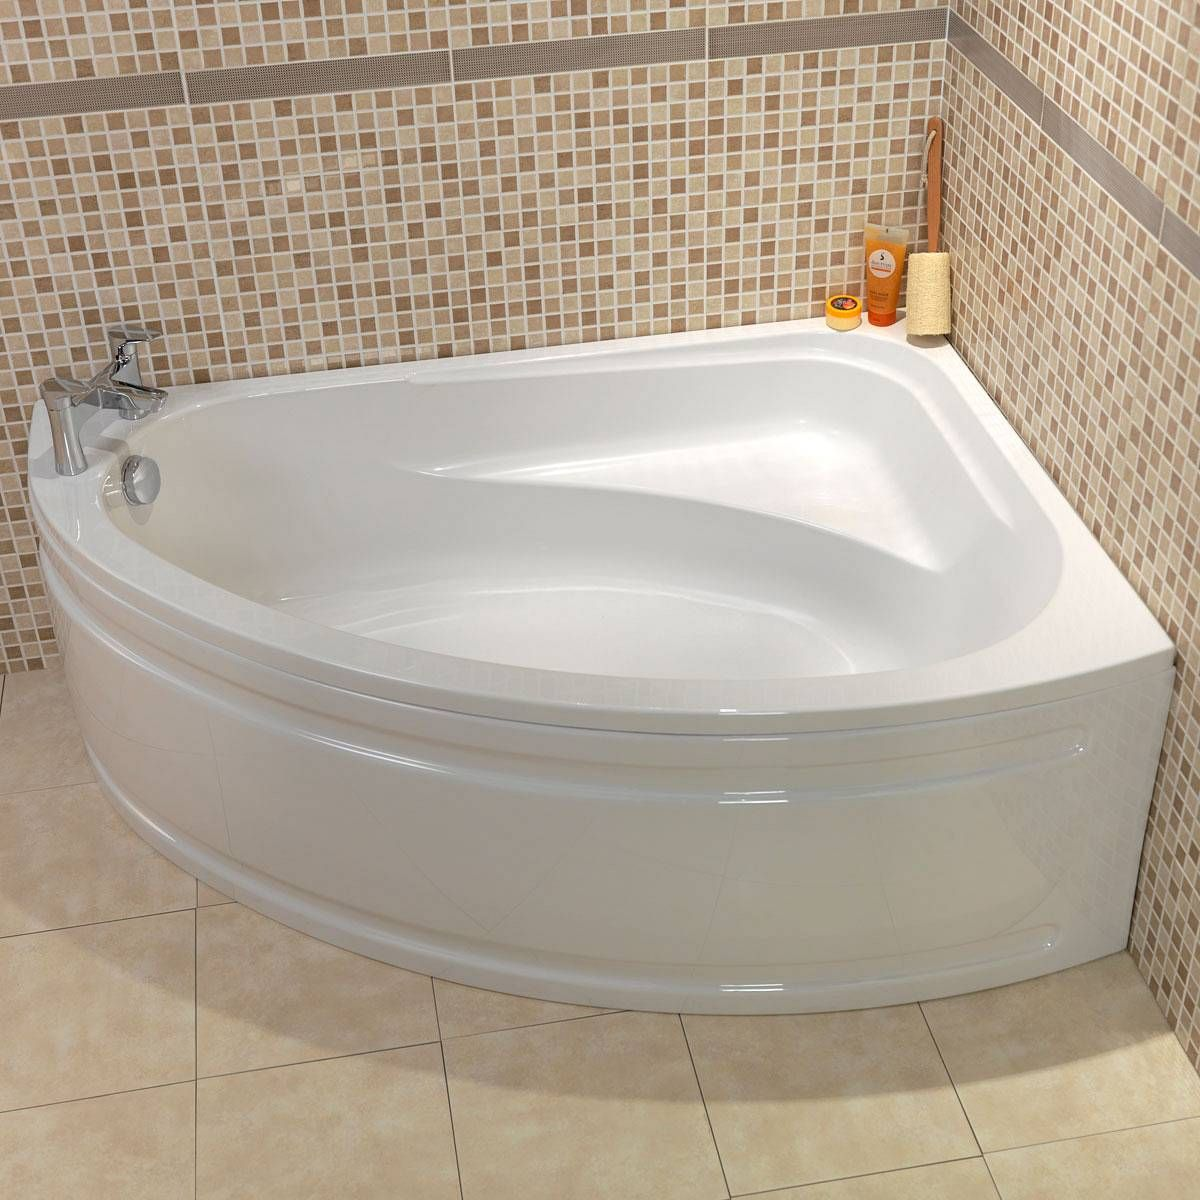 Orchard elsdon right handed corner bath in 2019 - Corner bathtub shower combo small bathroom ...